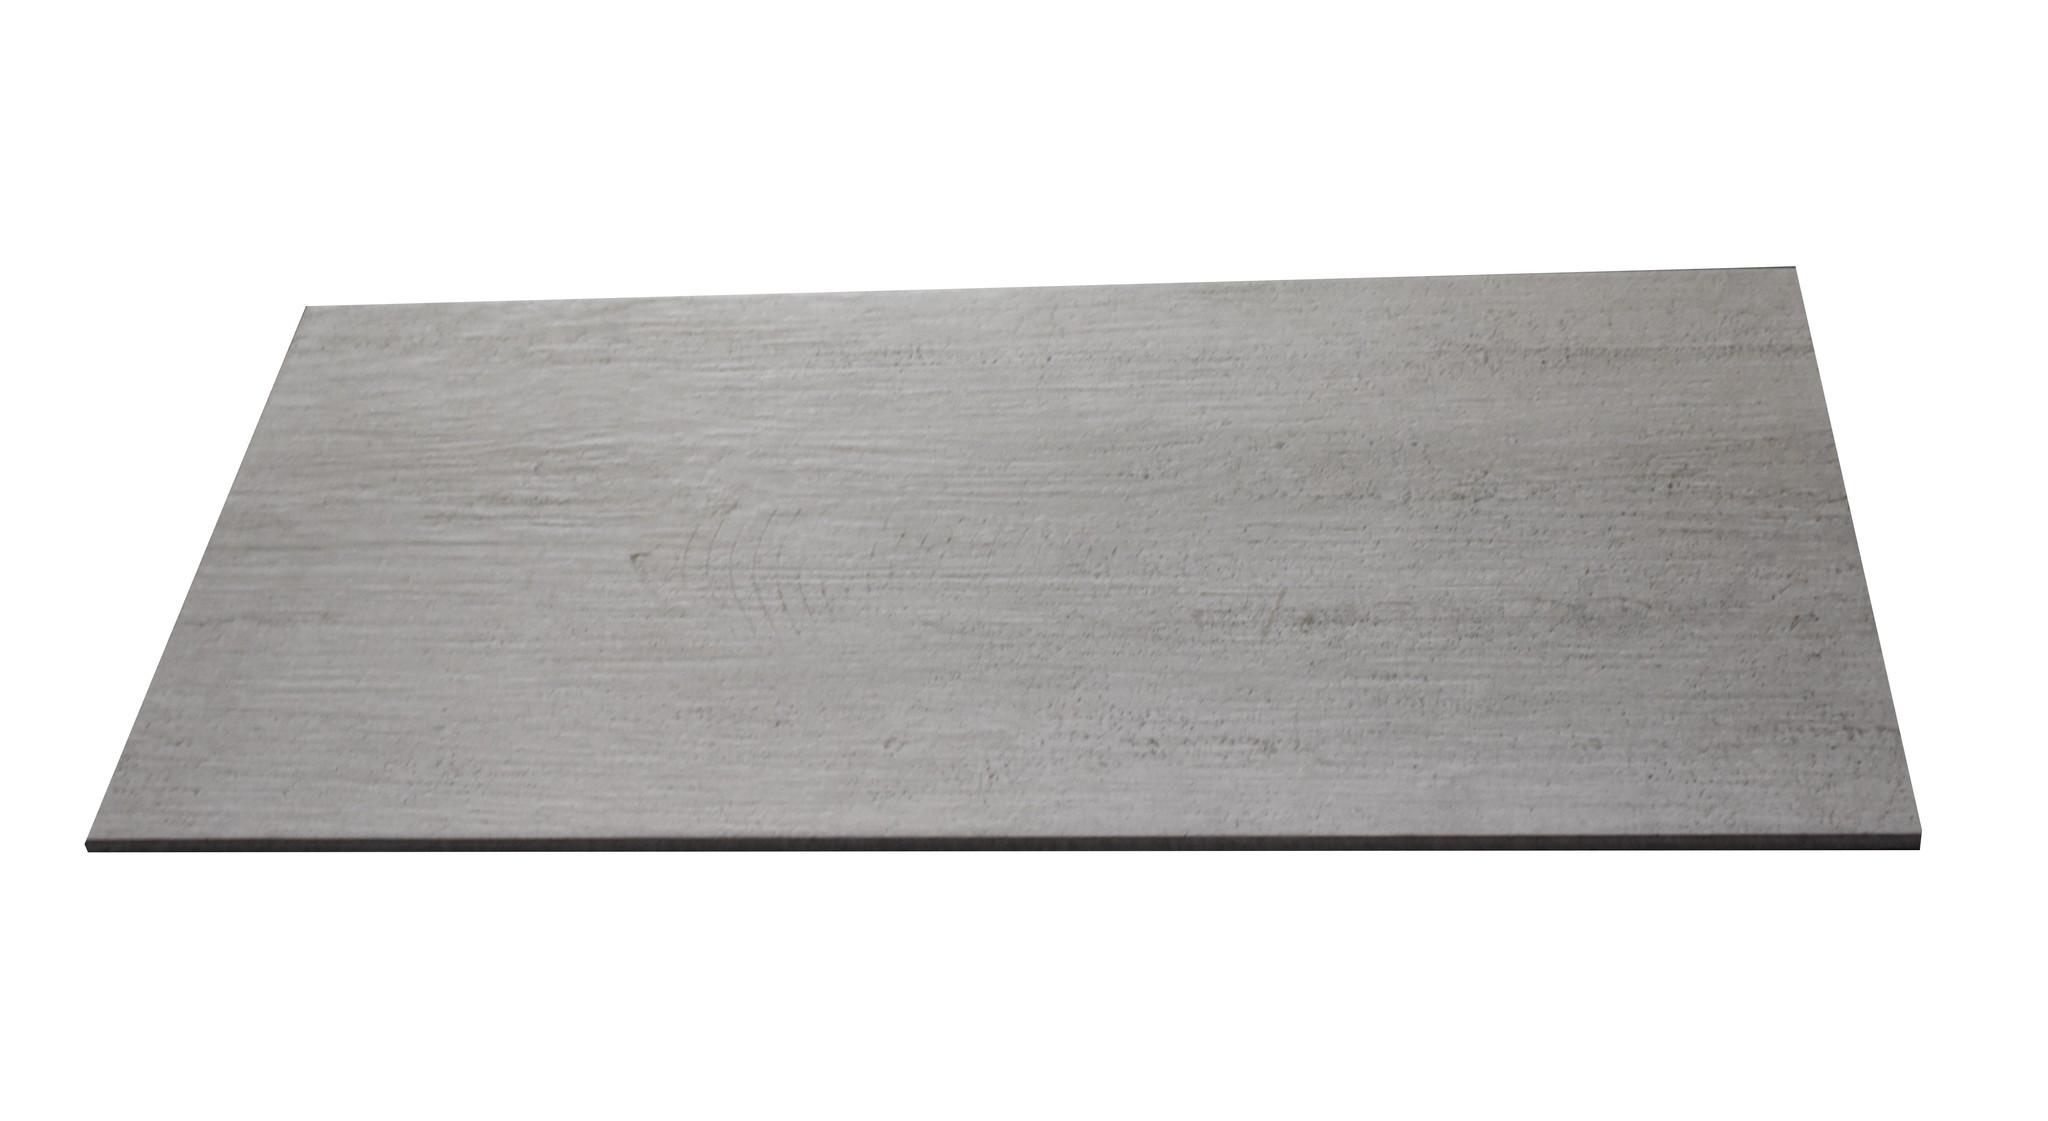 Jroco Plunc vloertegels